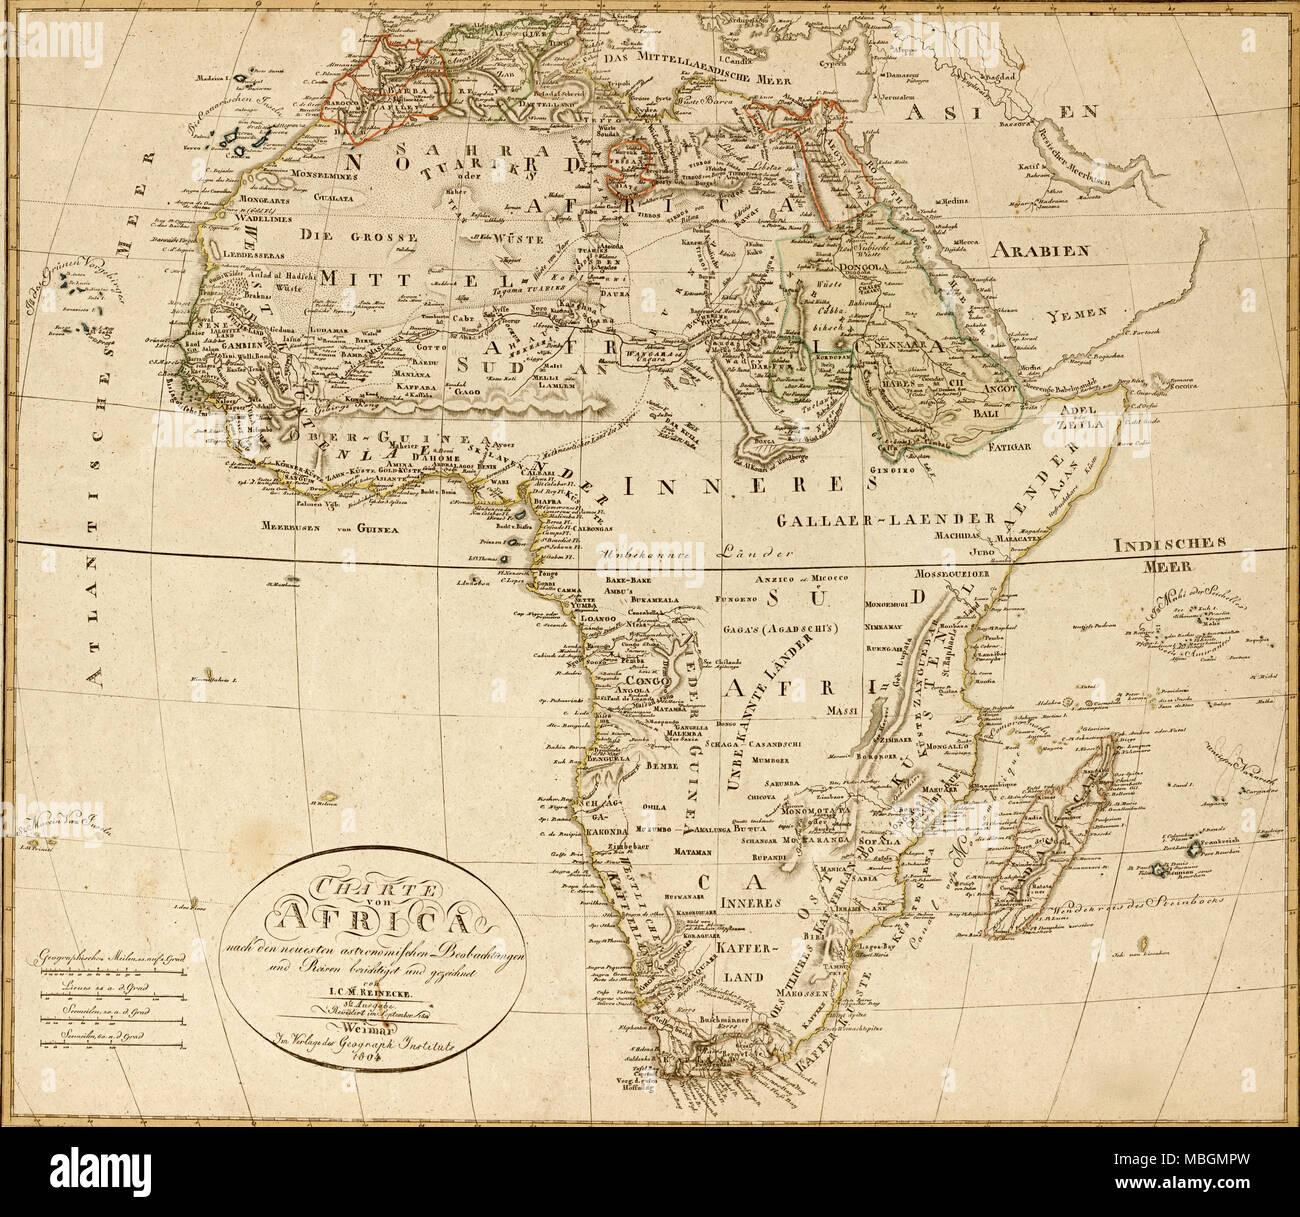 Africa - 1804 - Stock Image